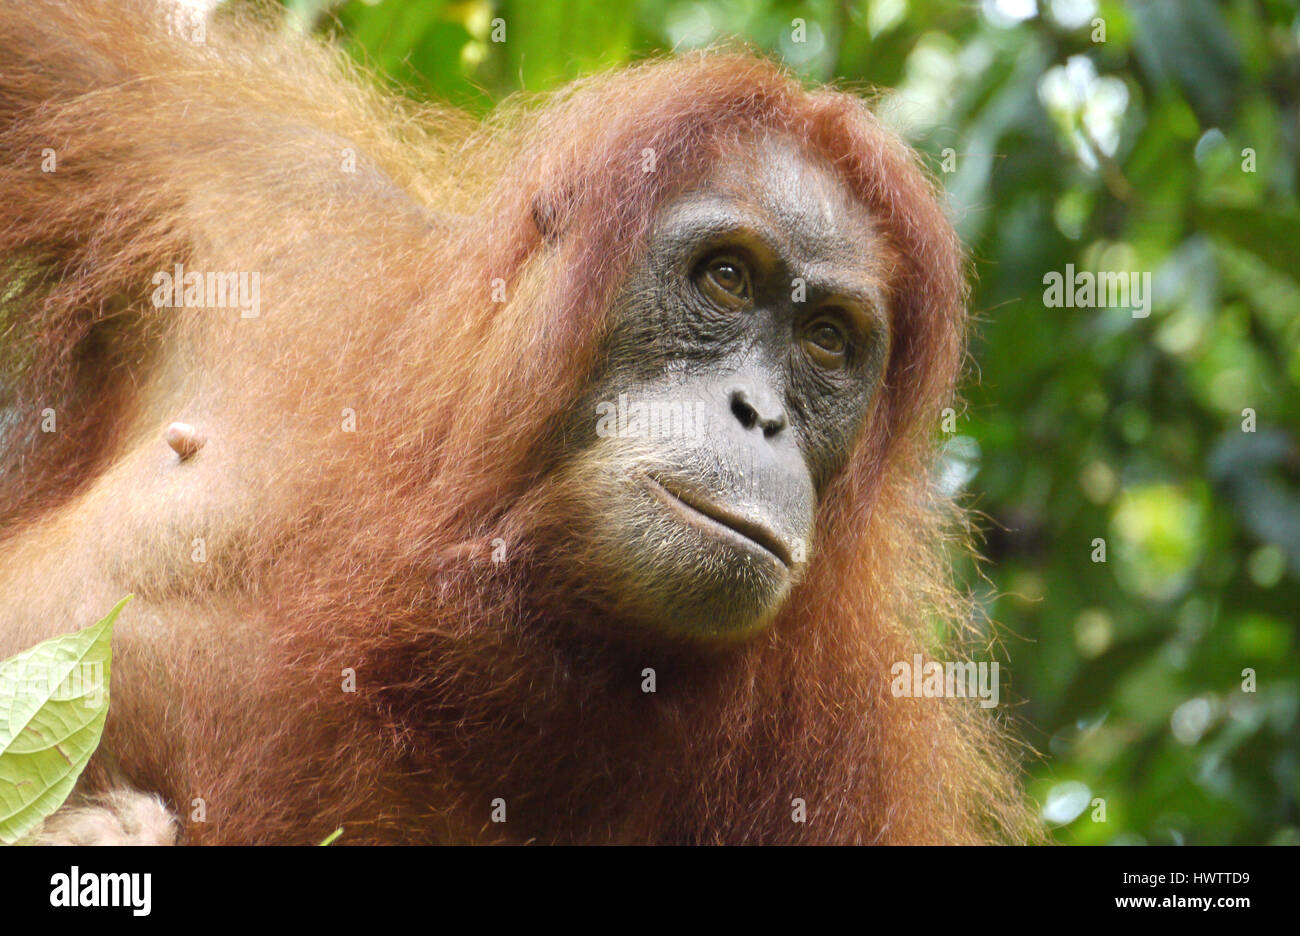 L'Indonésie, de l'orang-outan de Sumatra Photo Stock